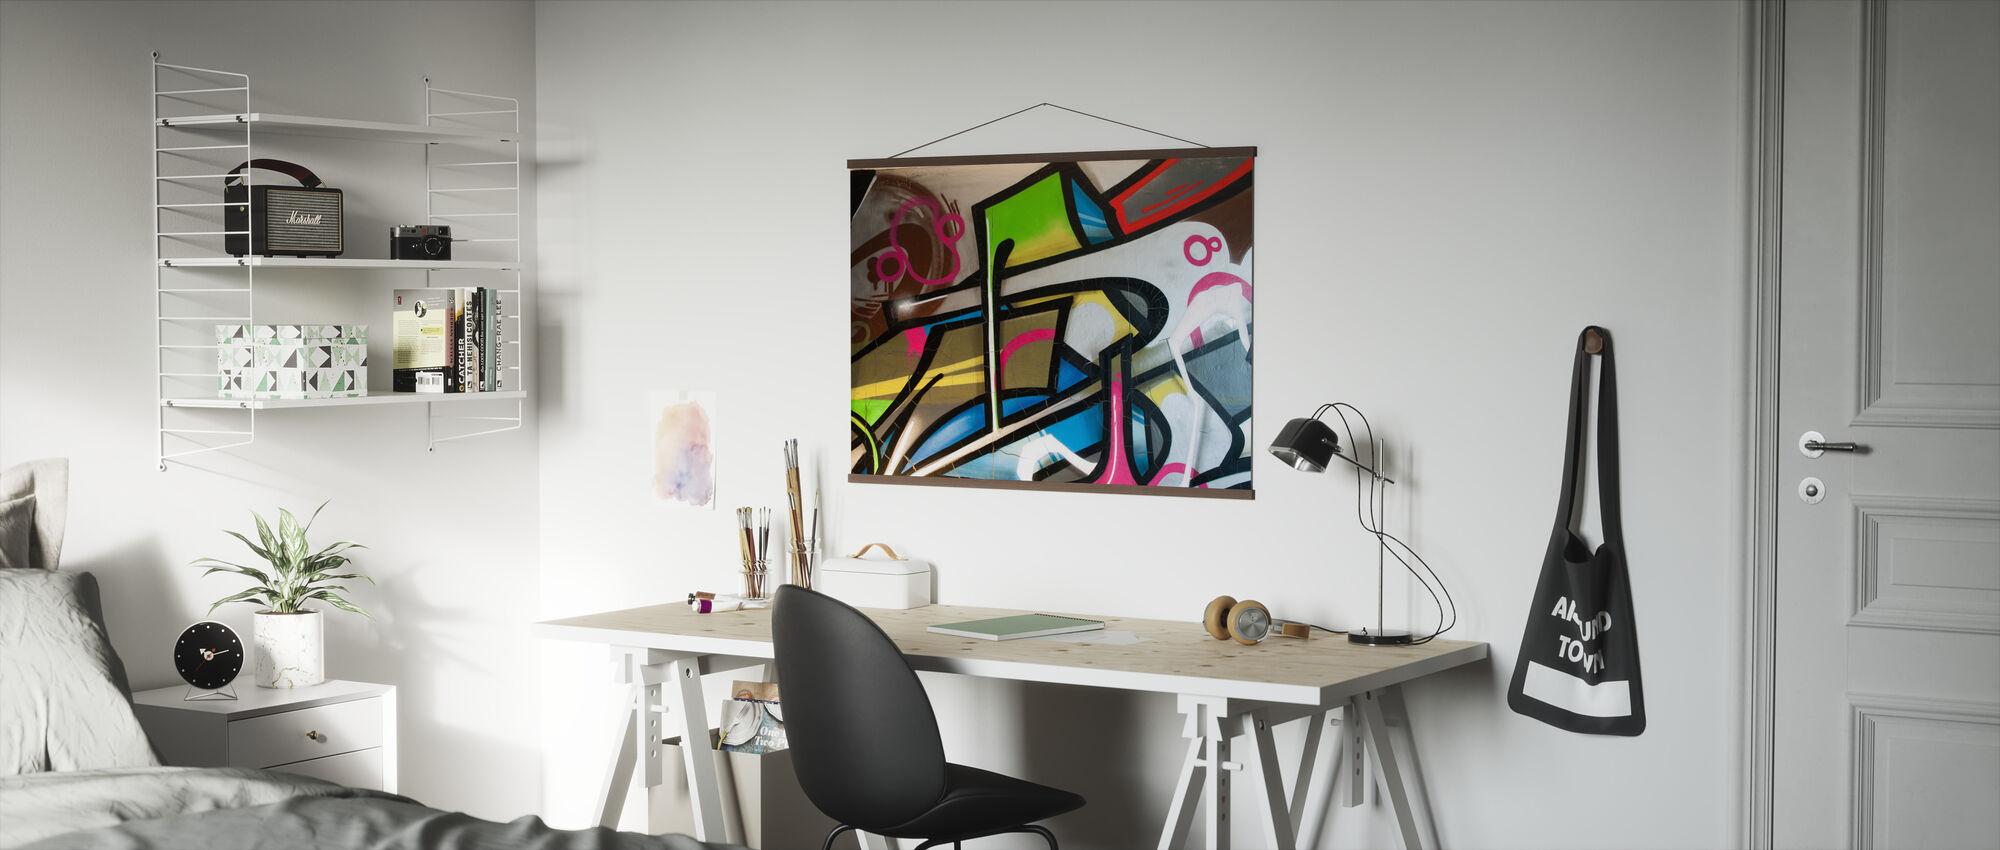 Colorful Graffiti - Poster - Office